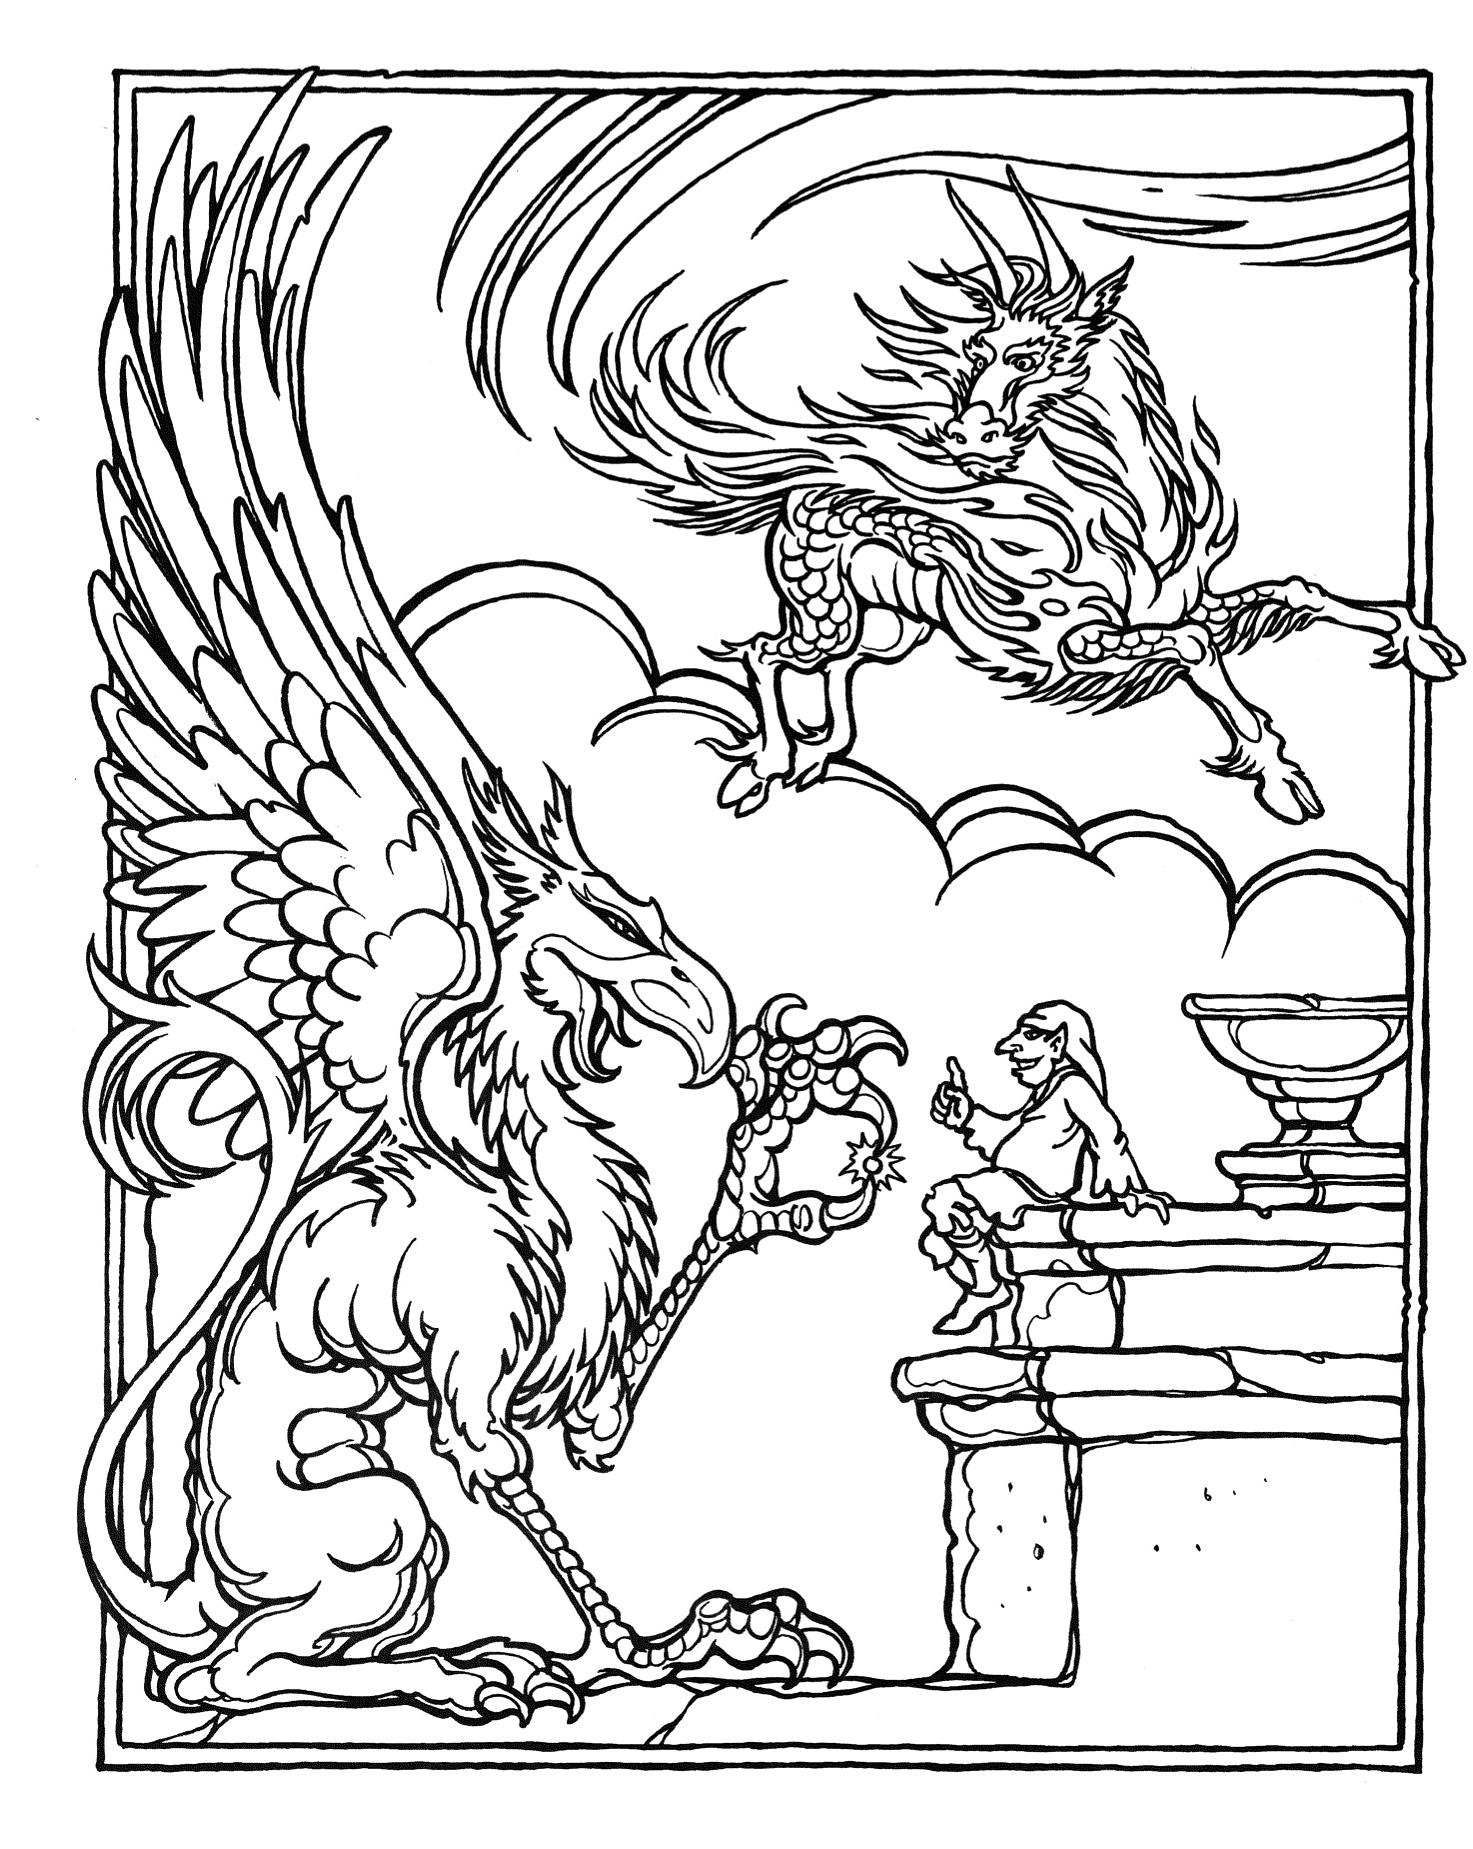 dragon coloring page coloring pages dragon coloring pages free and printable dragon coloring page